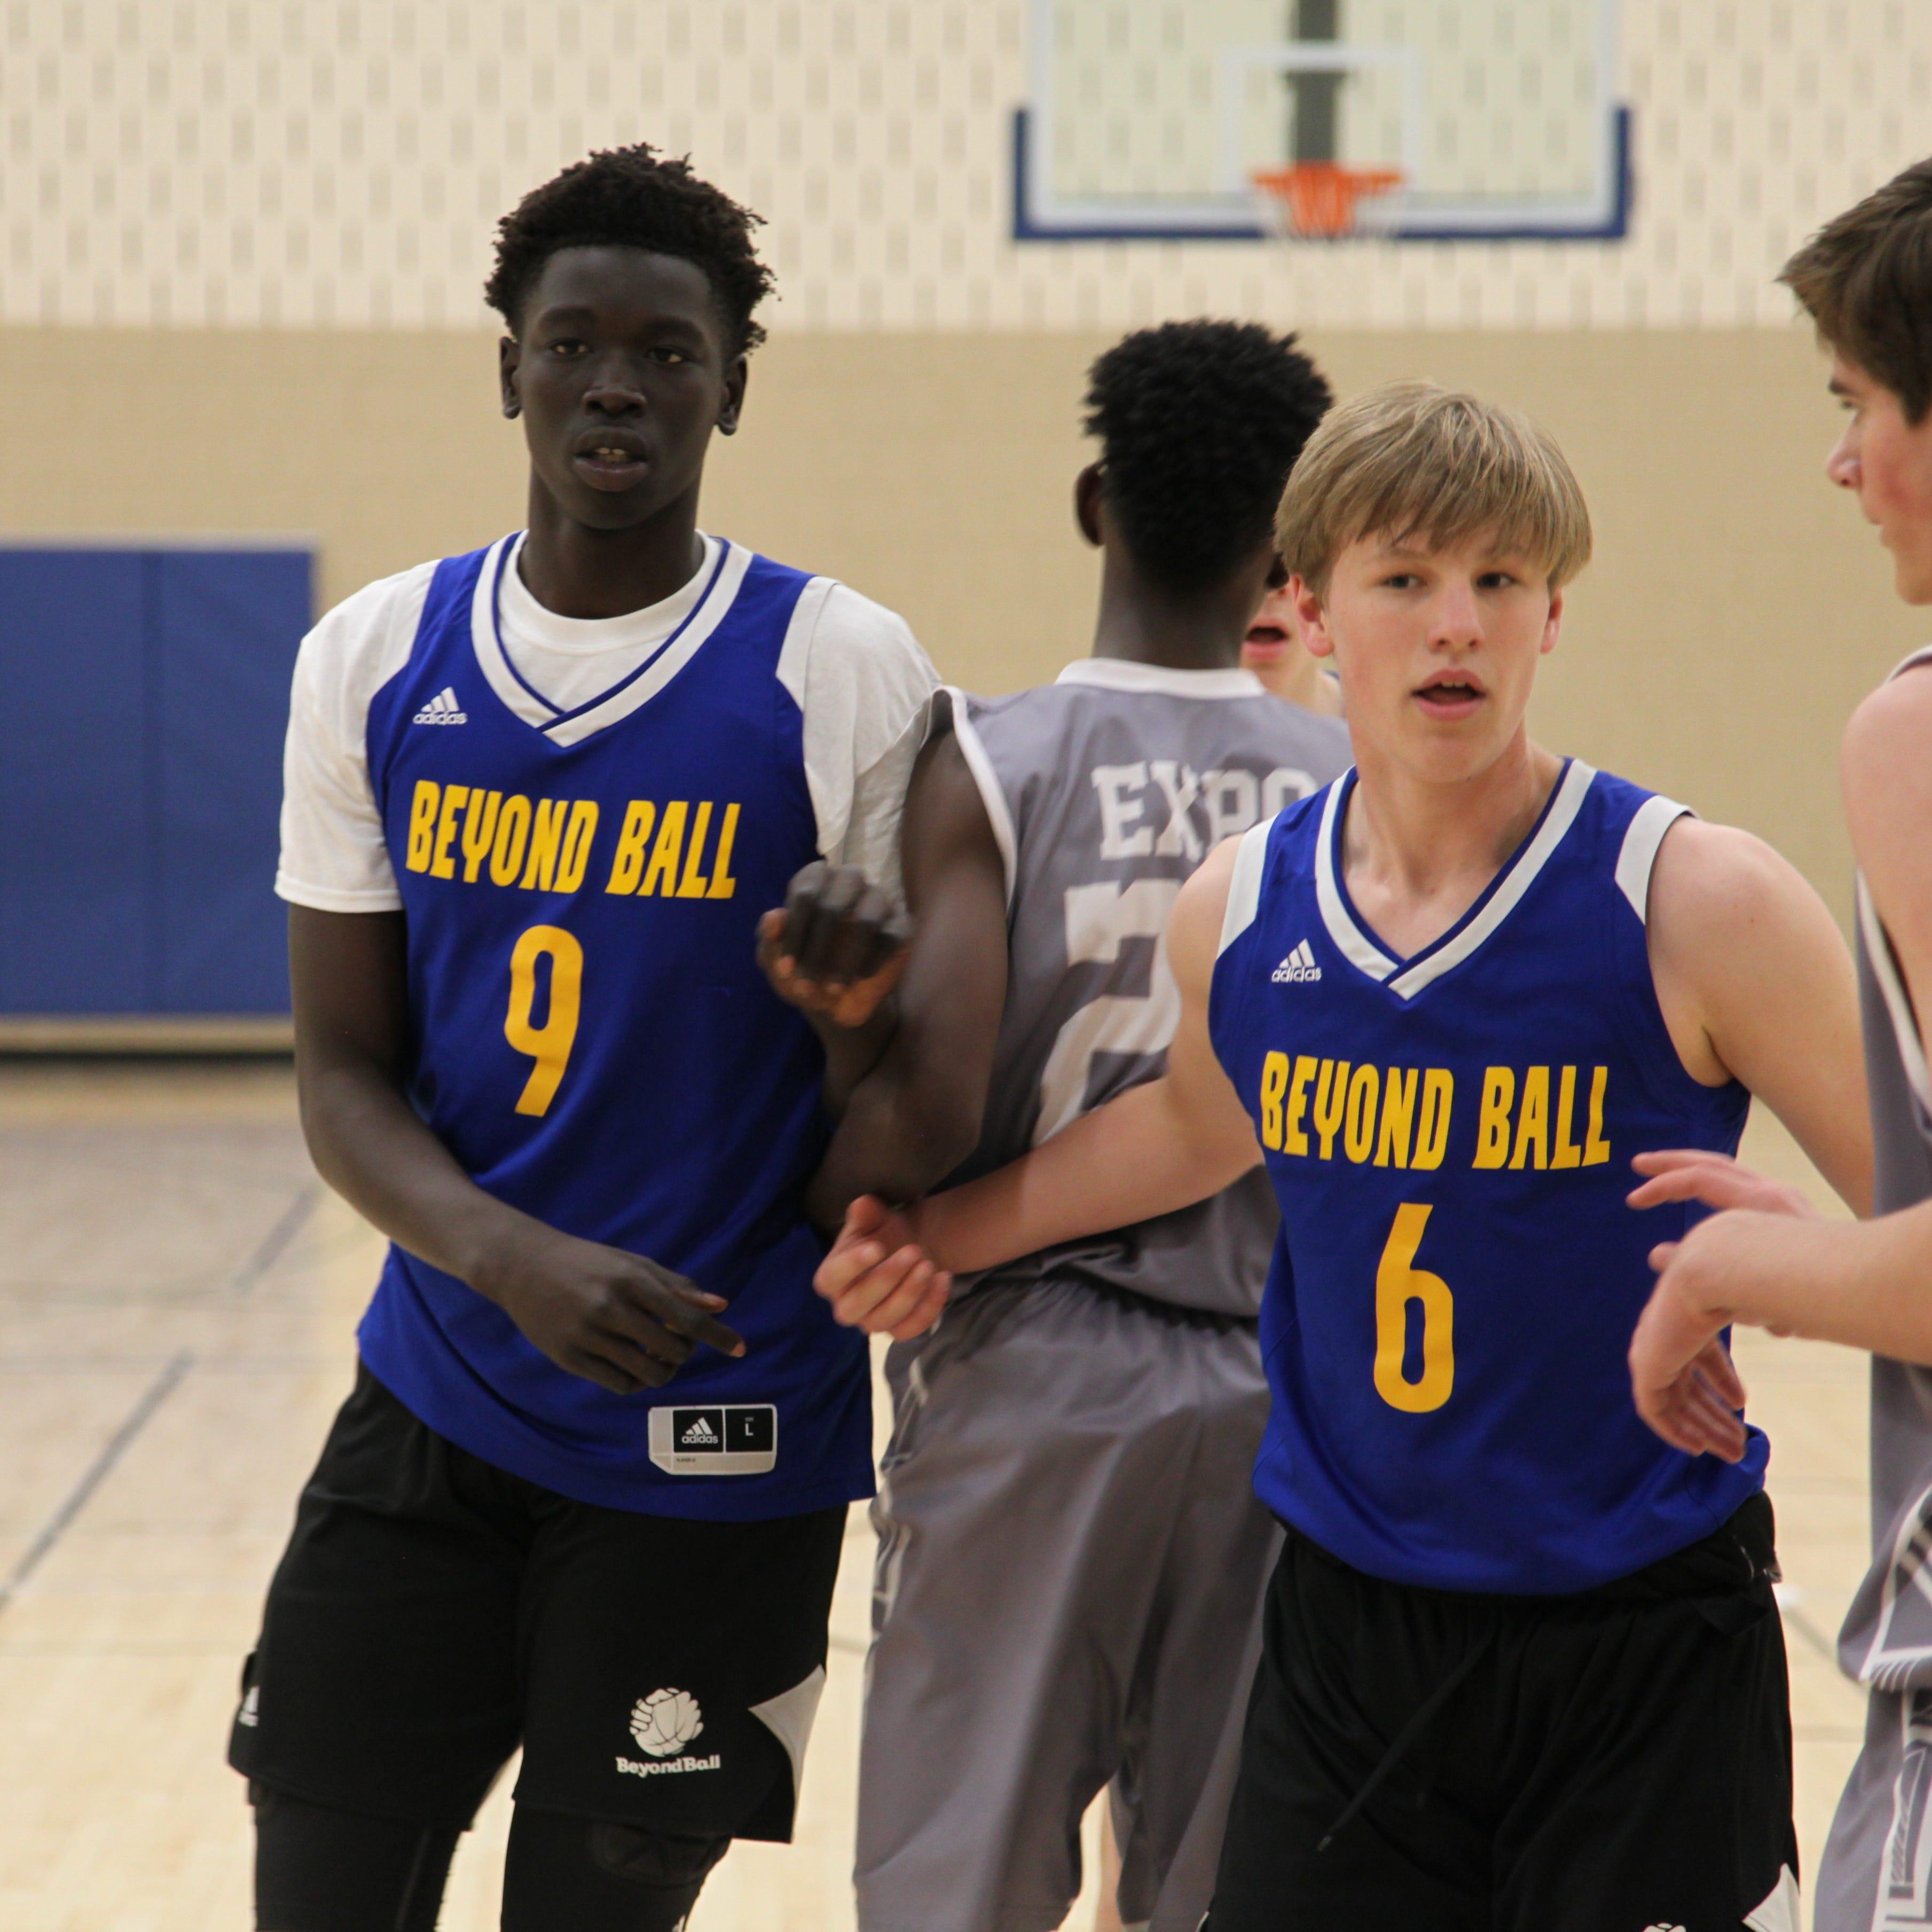 Nationally ranked basketball phenom Omaha Biliew will play at Dowling Catholic